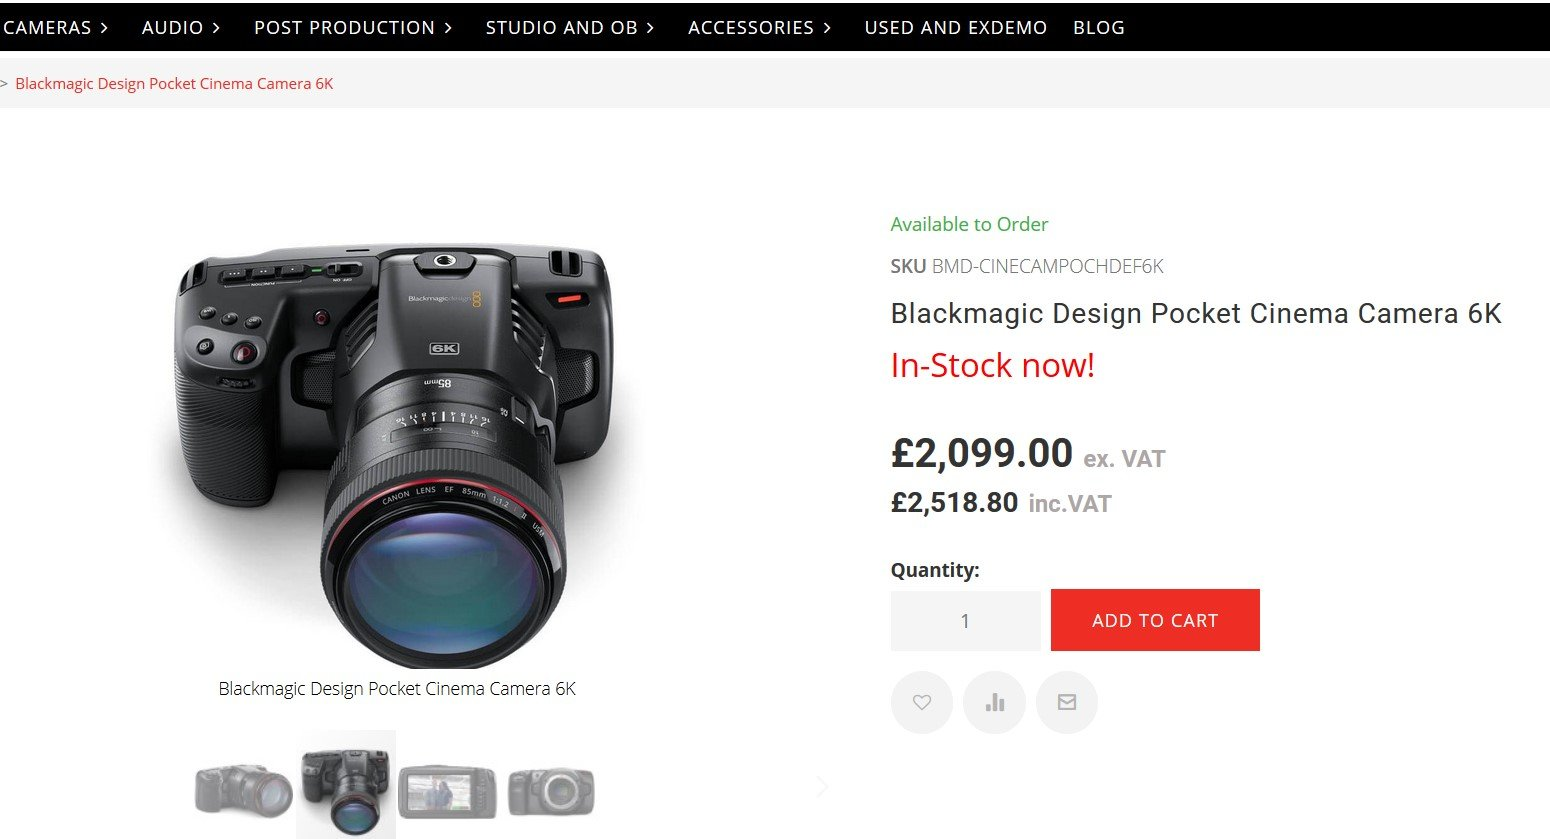 Blackmagic Pocket Cinema Camera 4K - Page 433 - EOSHD